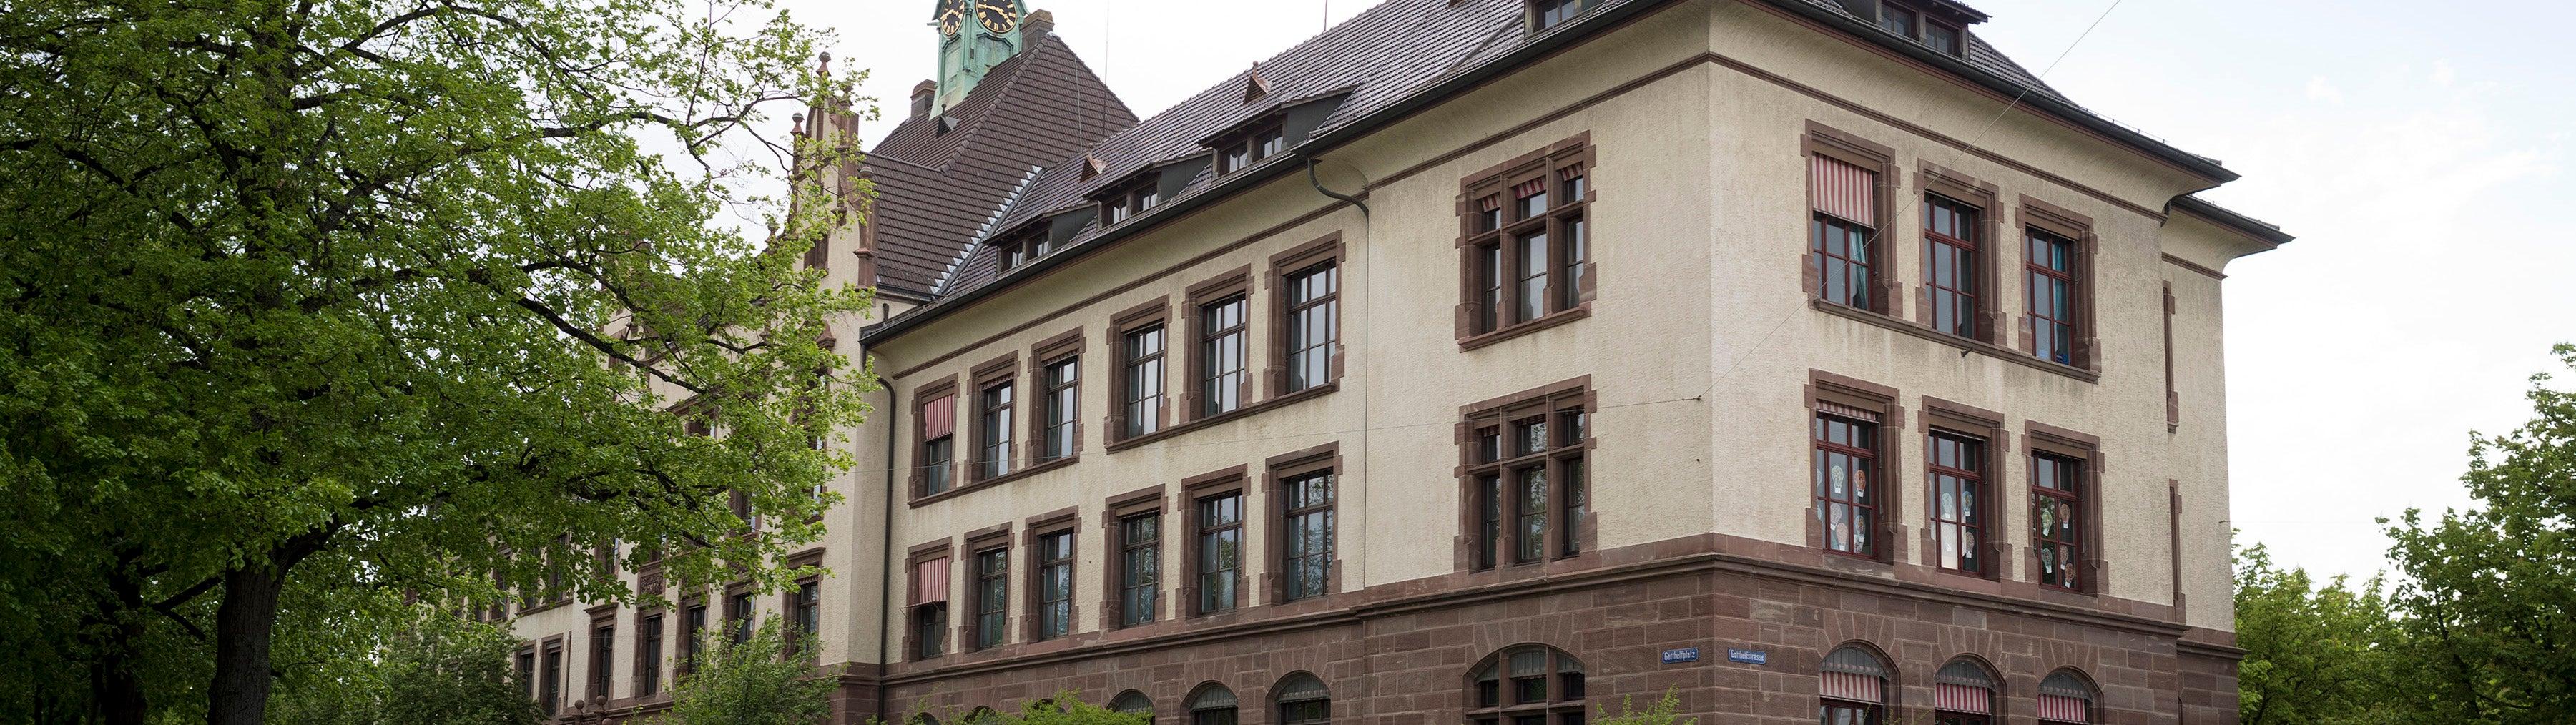 Basel, Gotthelf